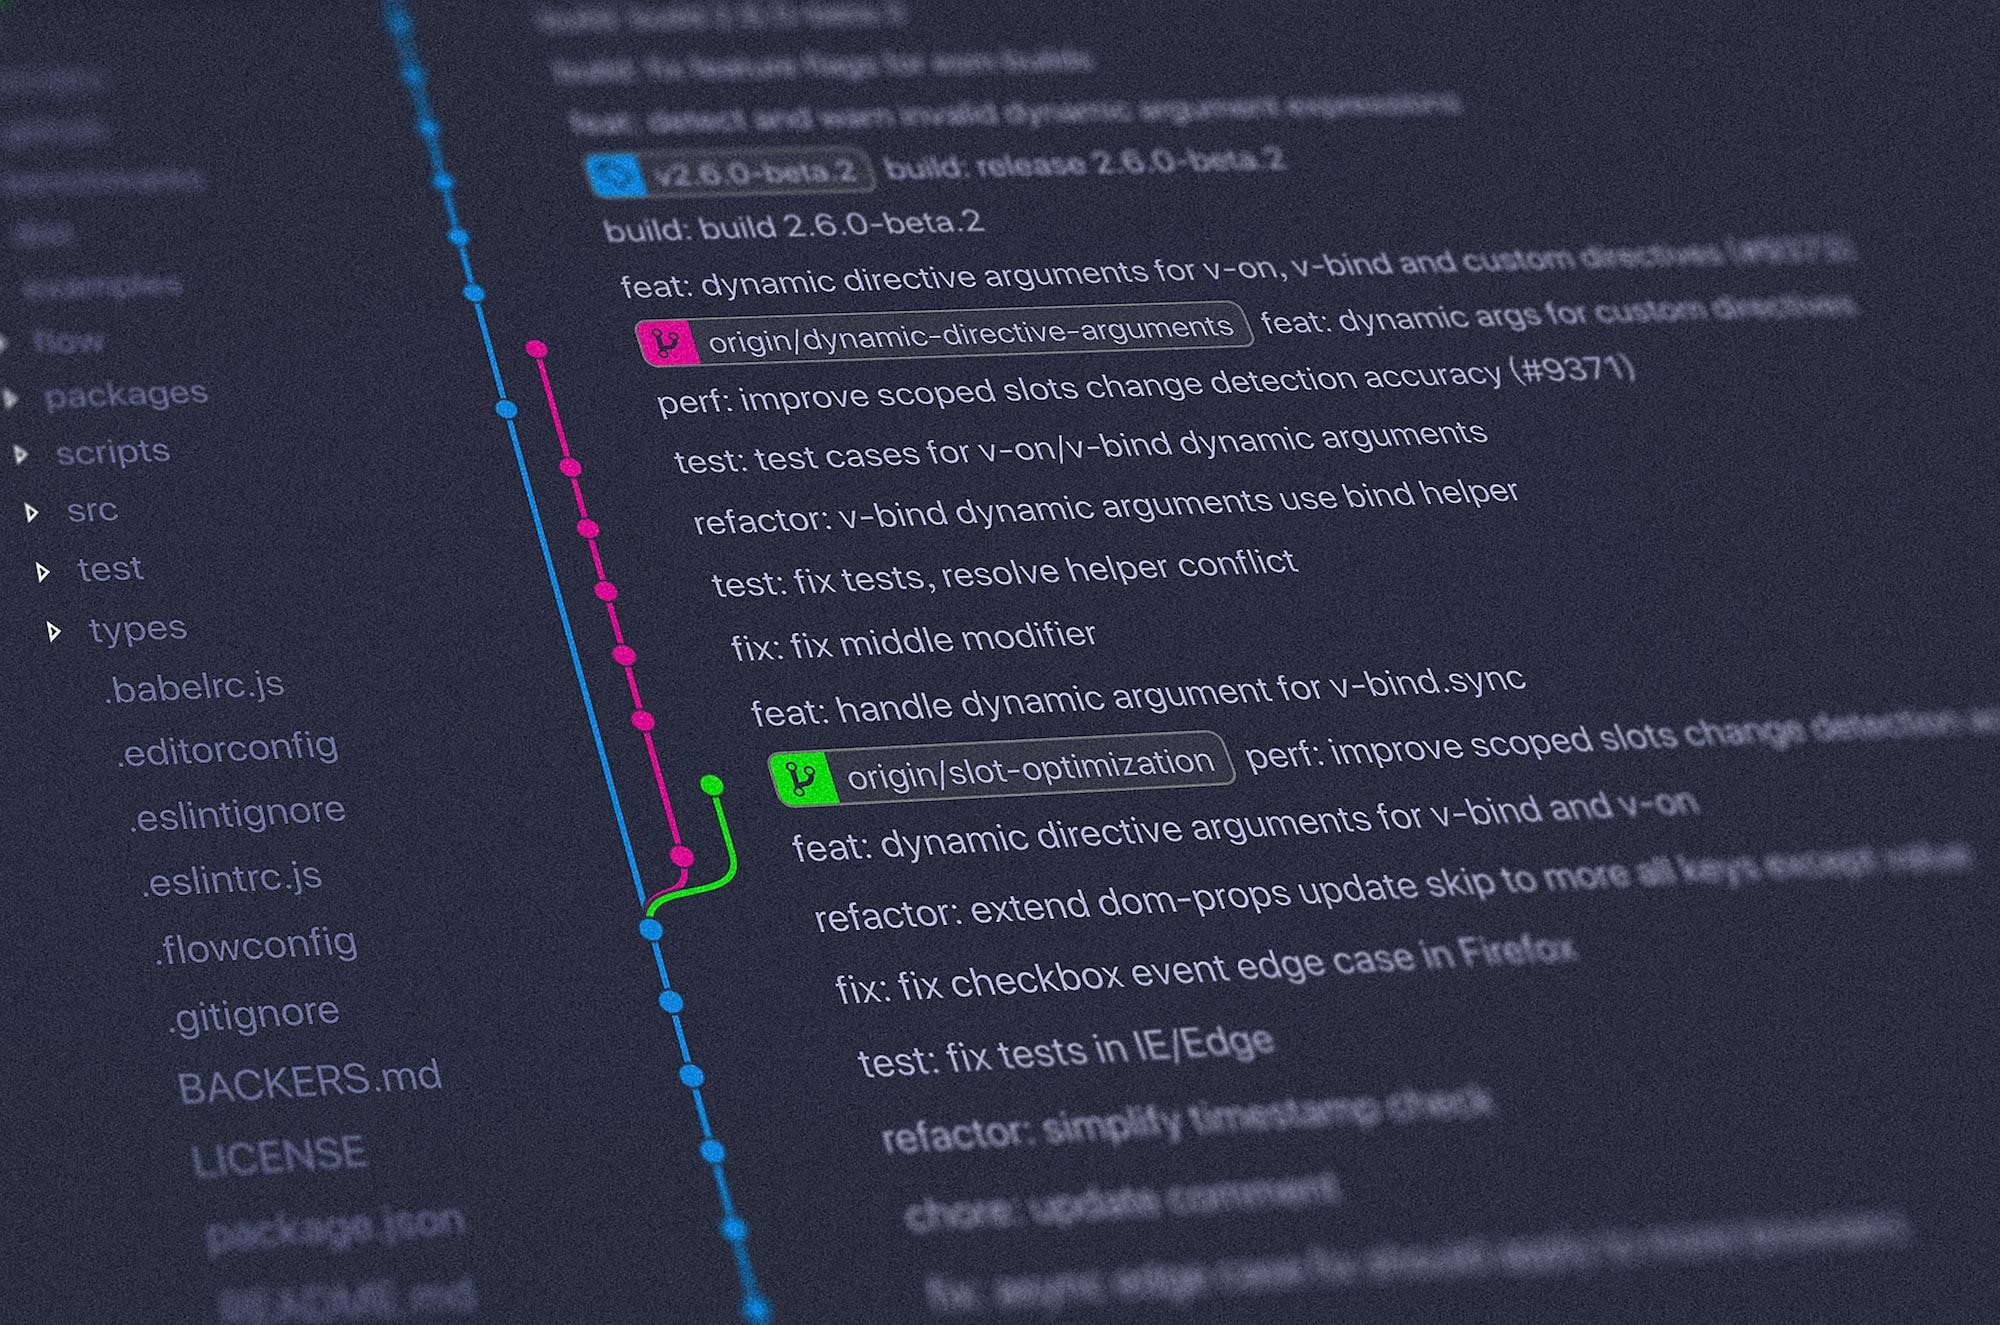 Visual Studio Code improved Hover Feedback and Debugging